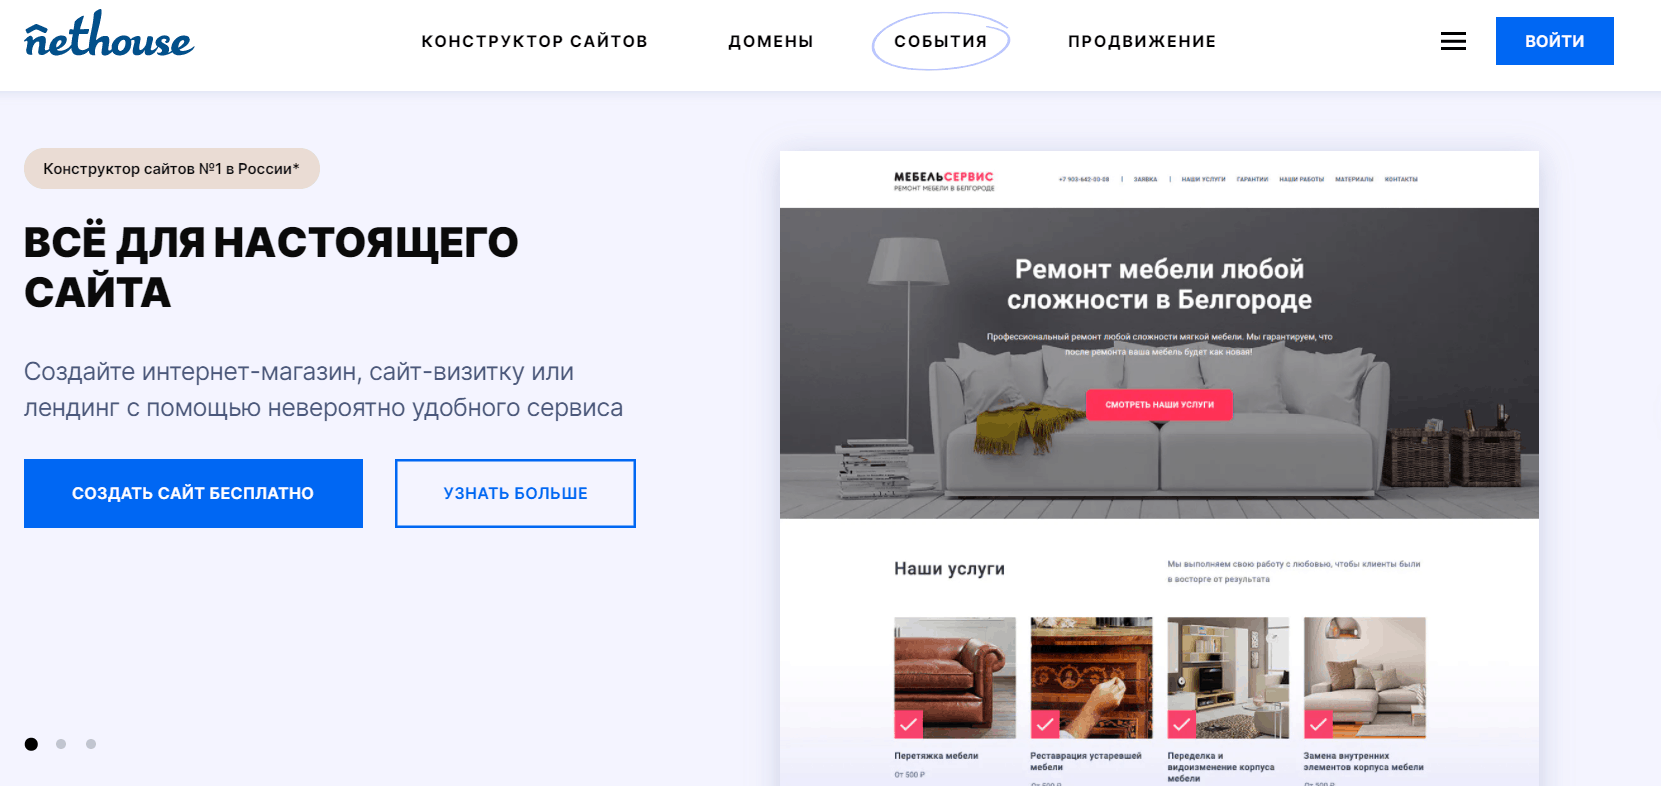 Онлайн-конструктор сайтов Nethouse